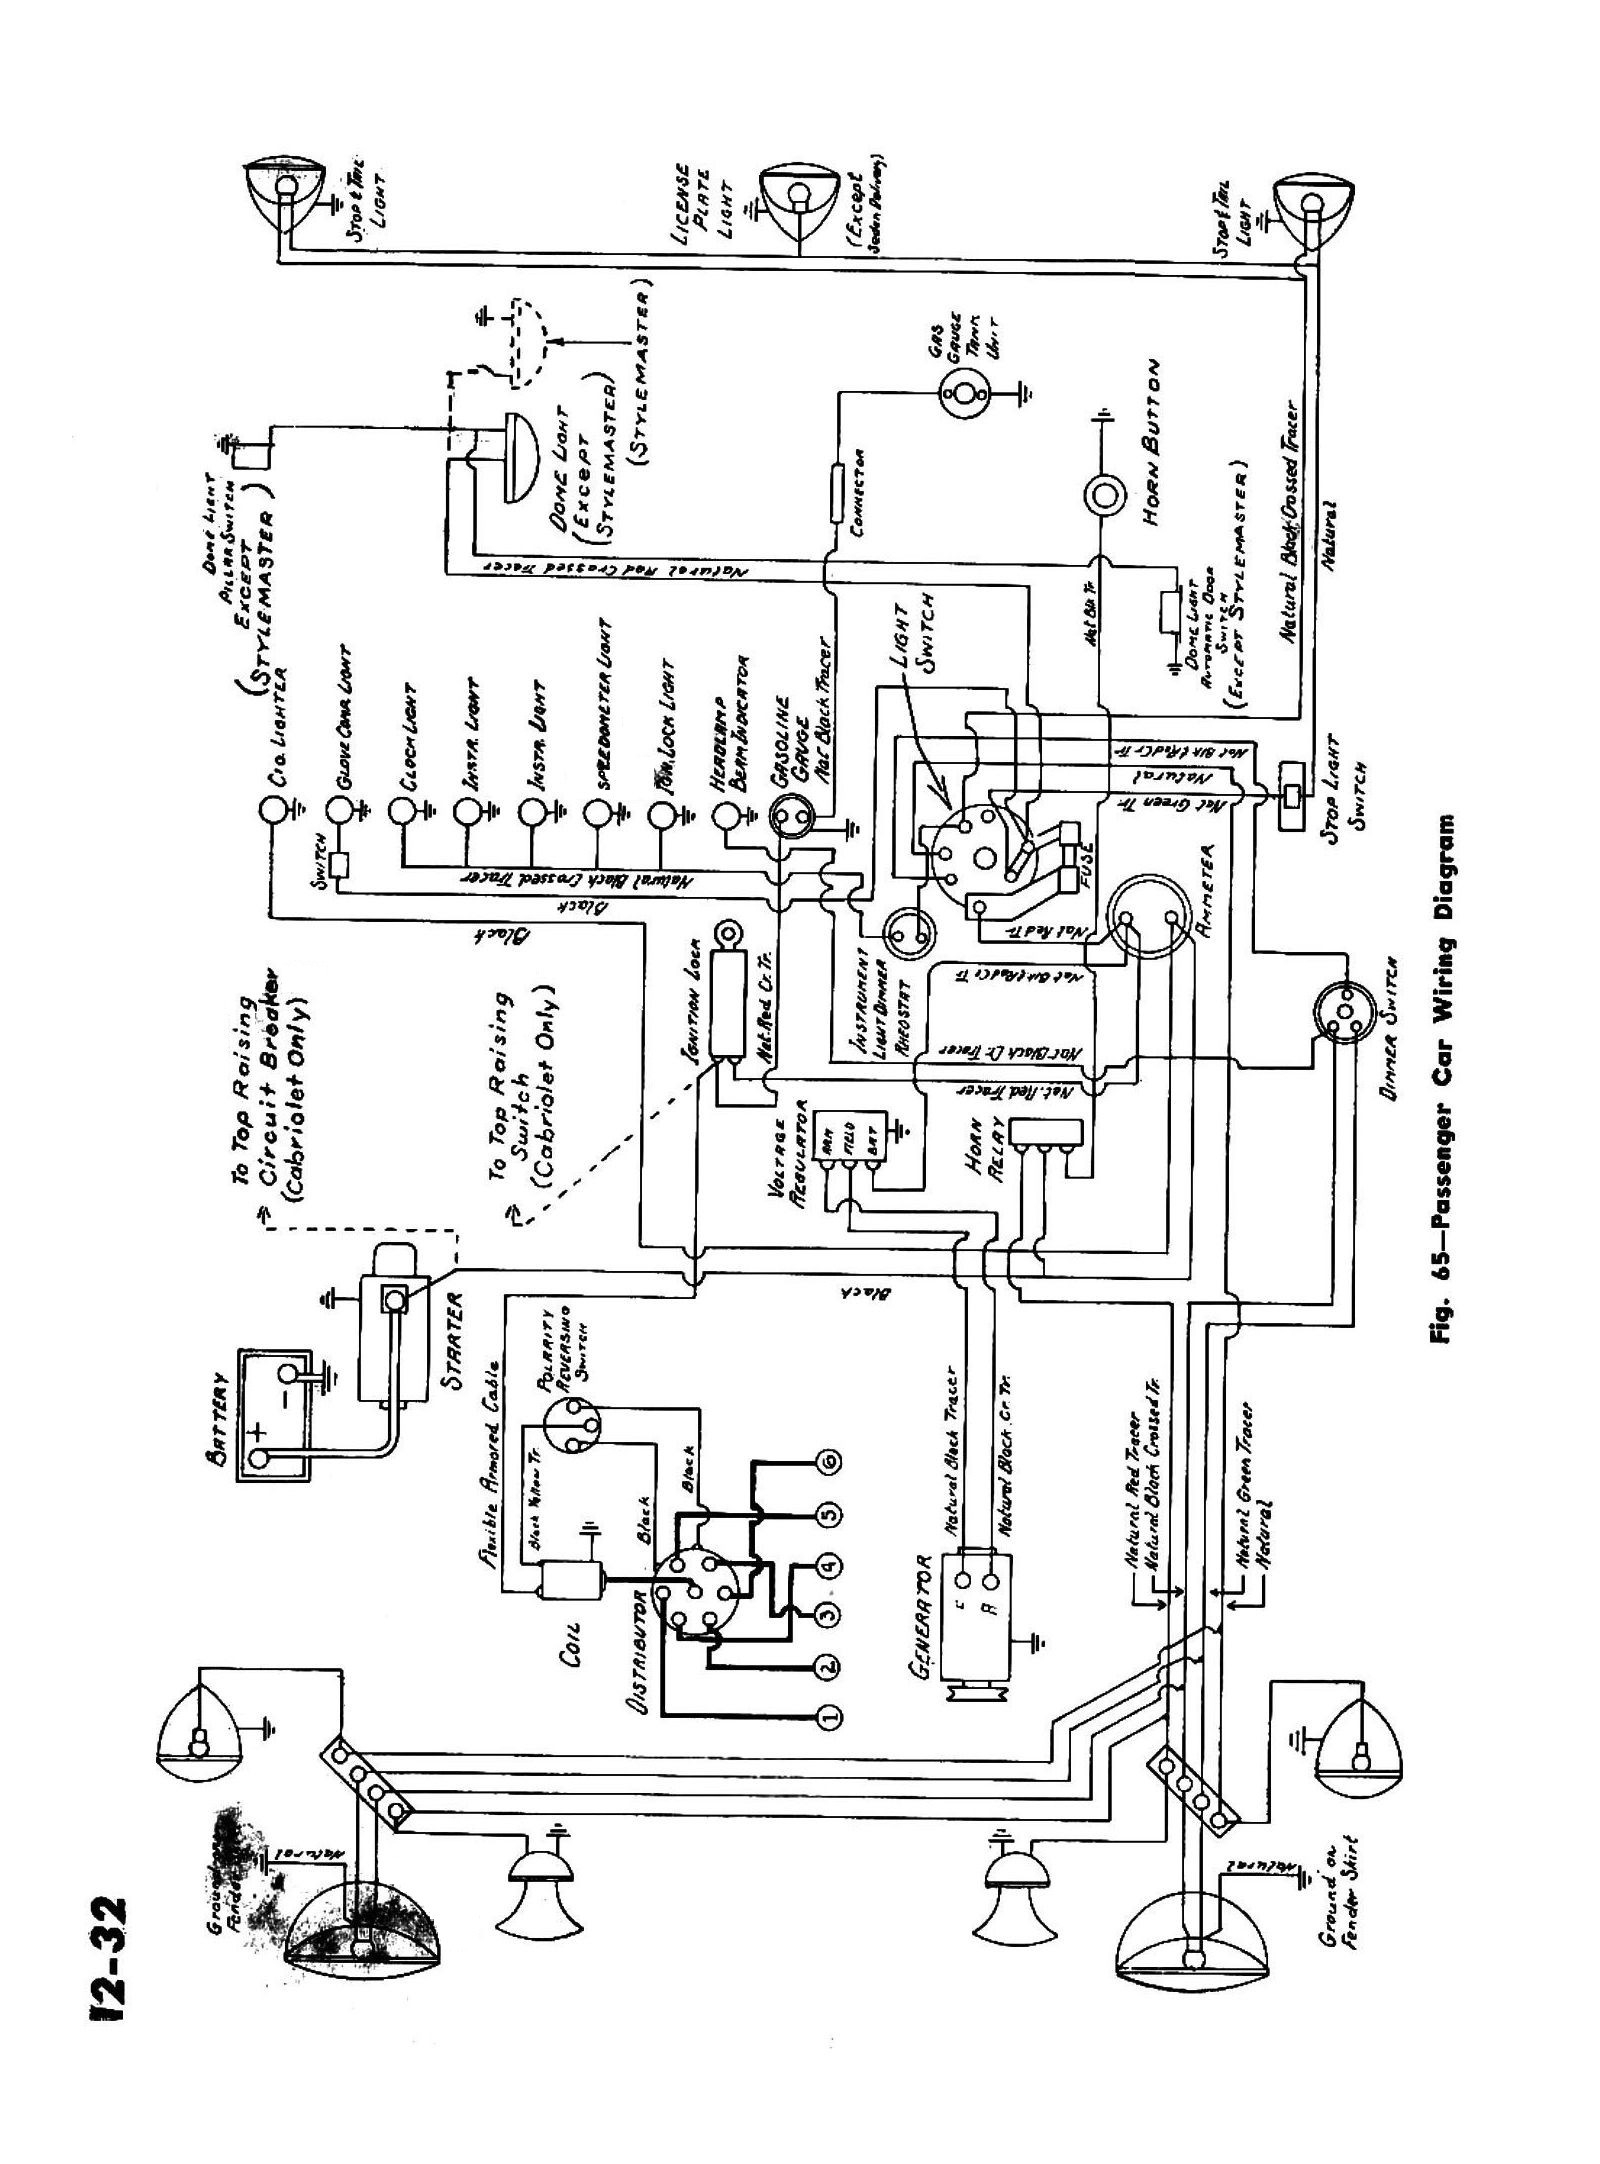 Car Dashboard Diagram Wiring Diagram Of Zen Car Schema Wiring Diagrams